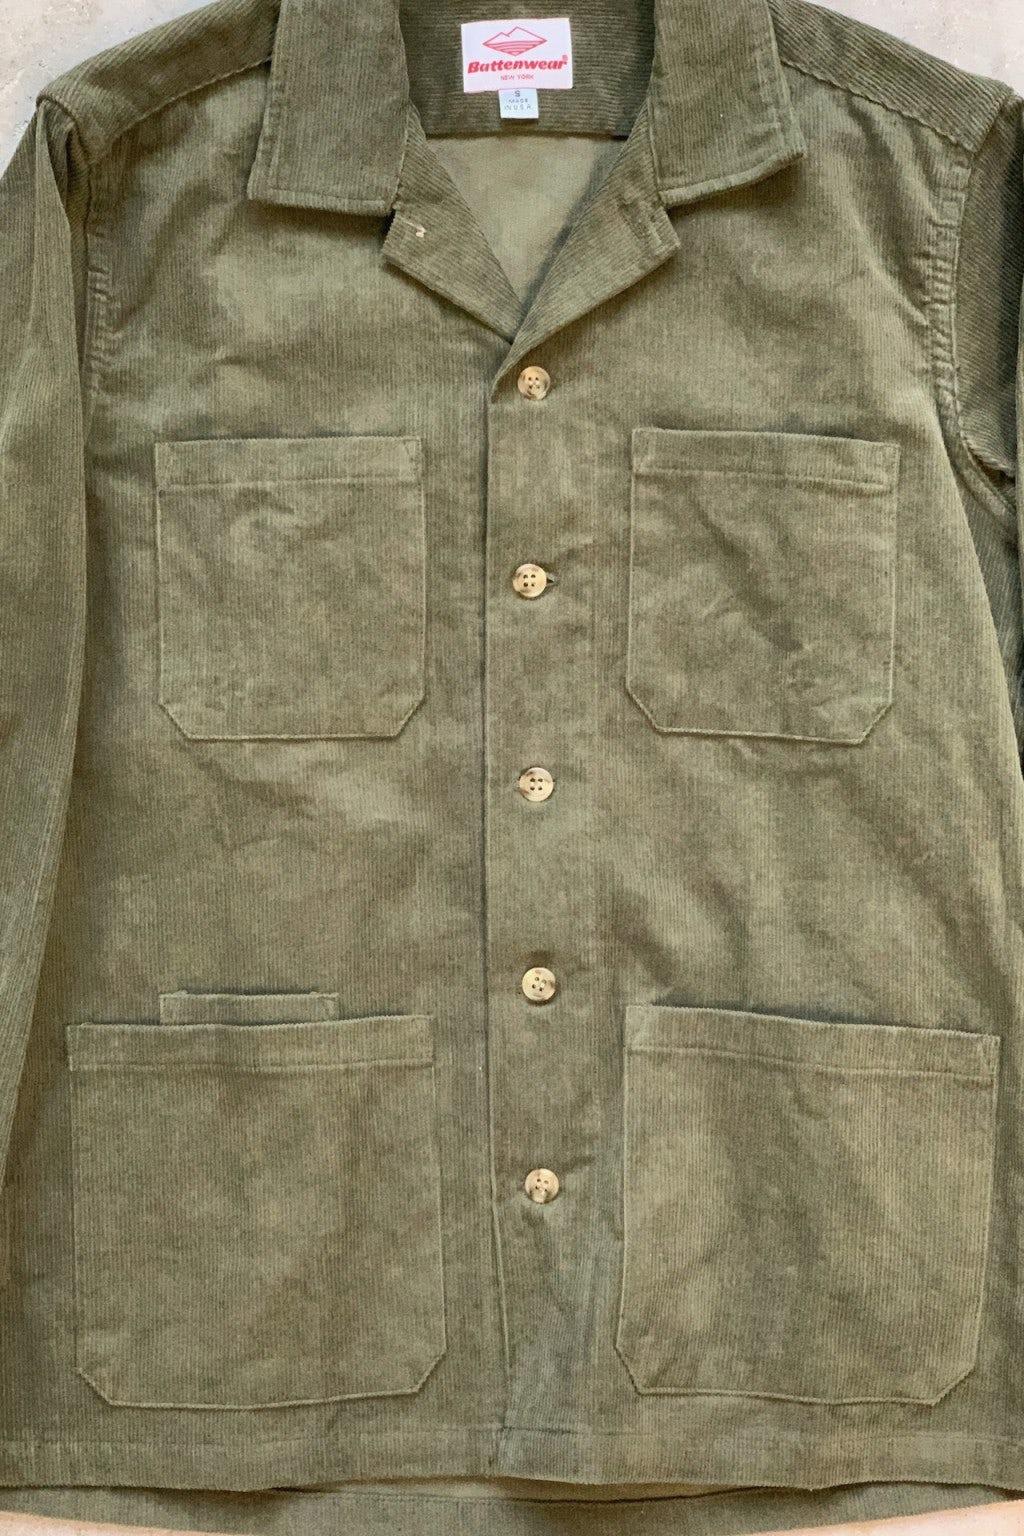 Battenwear Five Pocket Canyon Shirt Olive